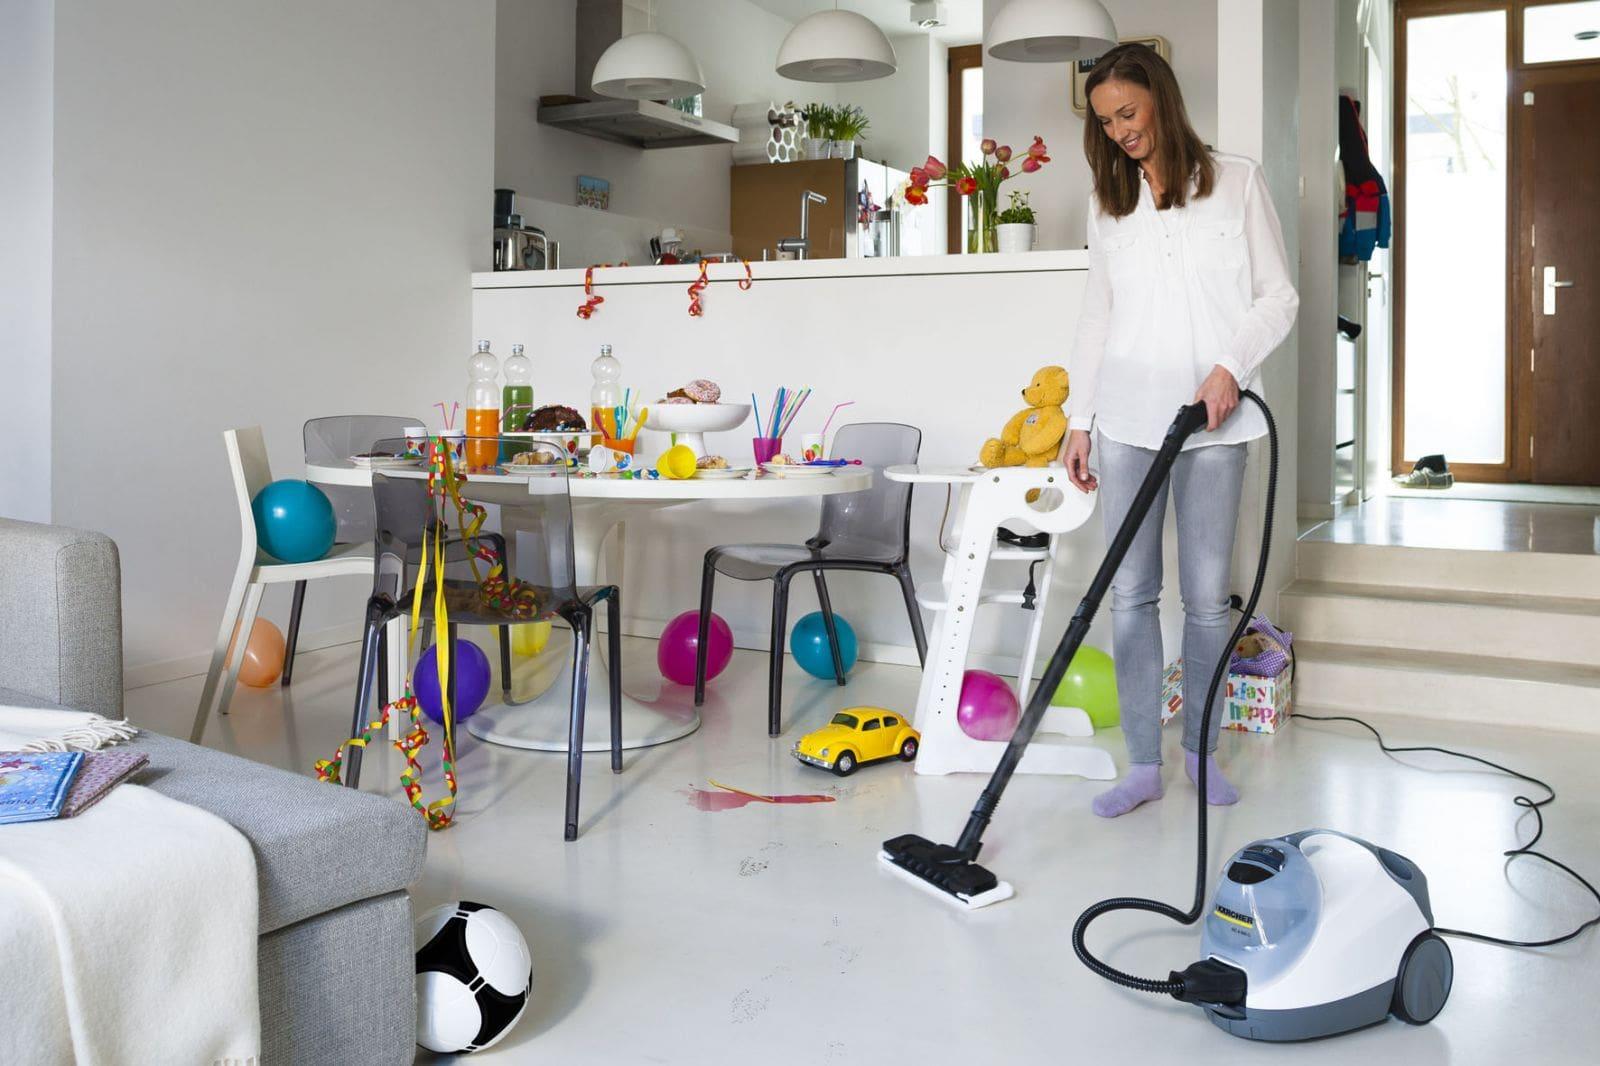 Чистота в комнате картинка